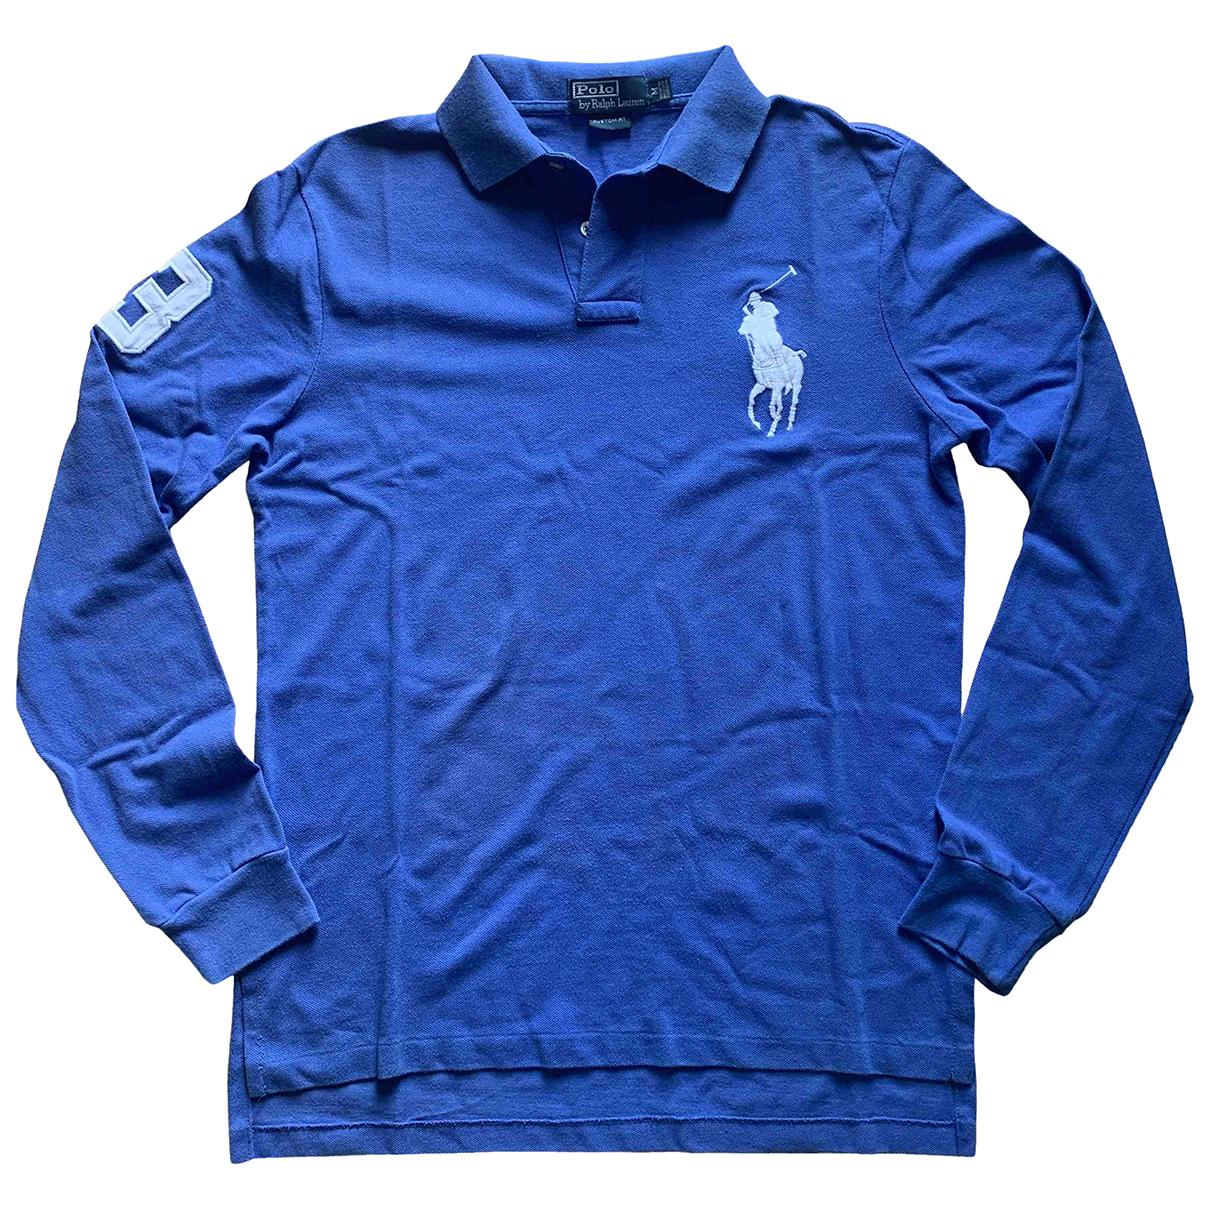 Polo Ralph Lauren Polo ajuste manches longues Poloshirts in  Blau Baumwolle